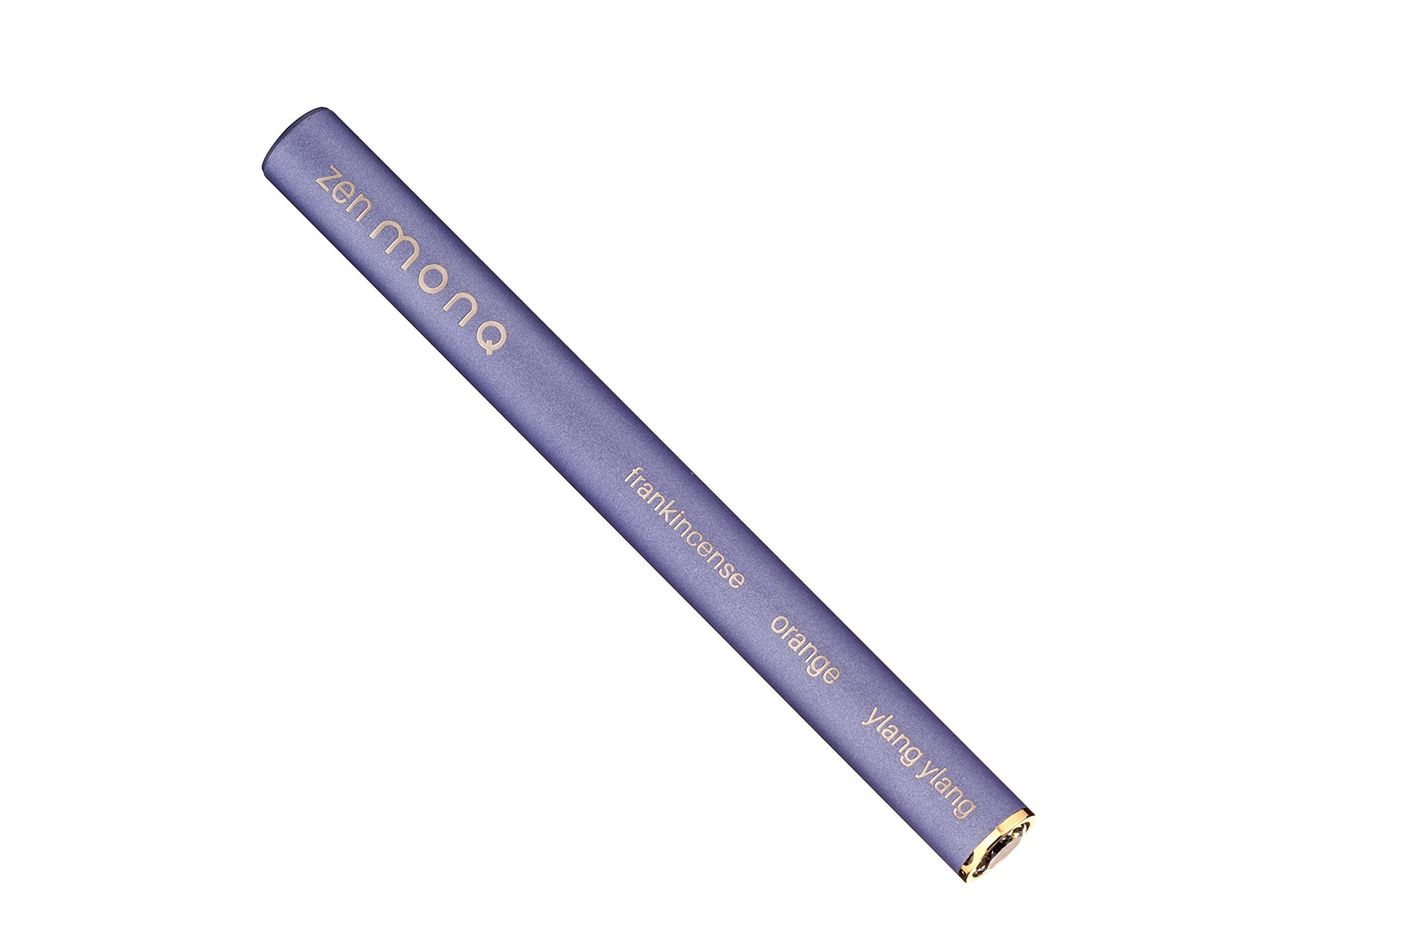 Monq Aromatherapy Inhaler